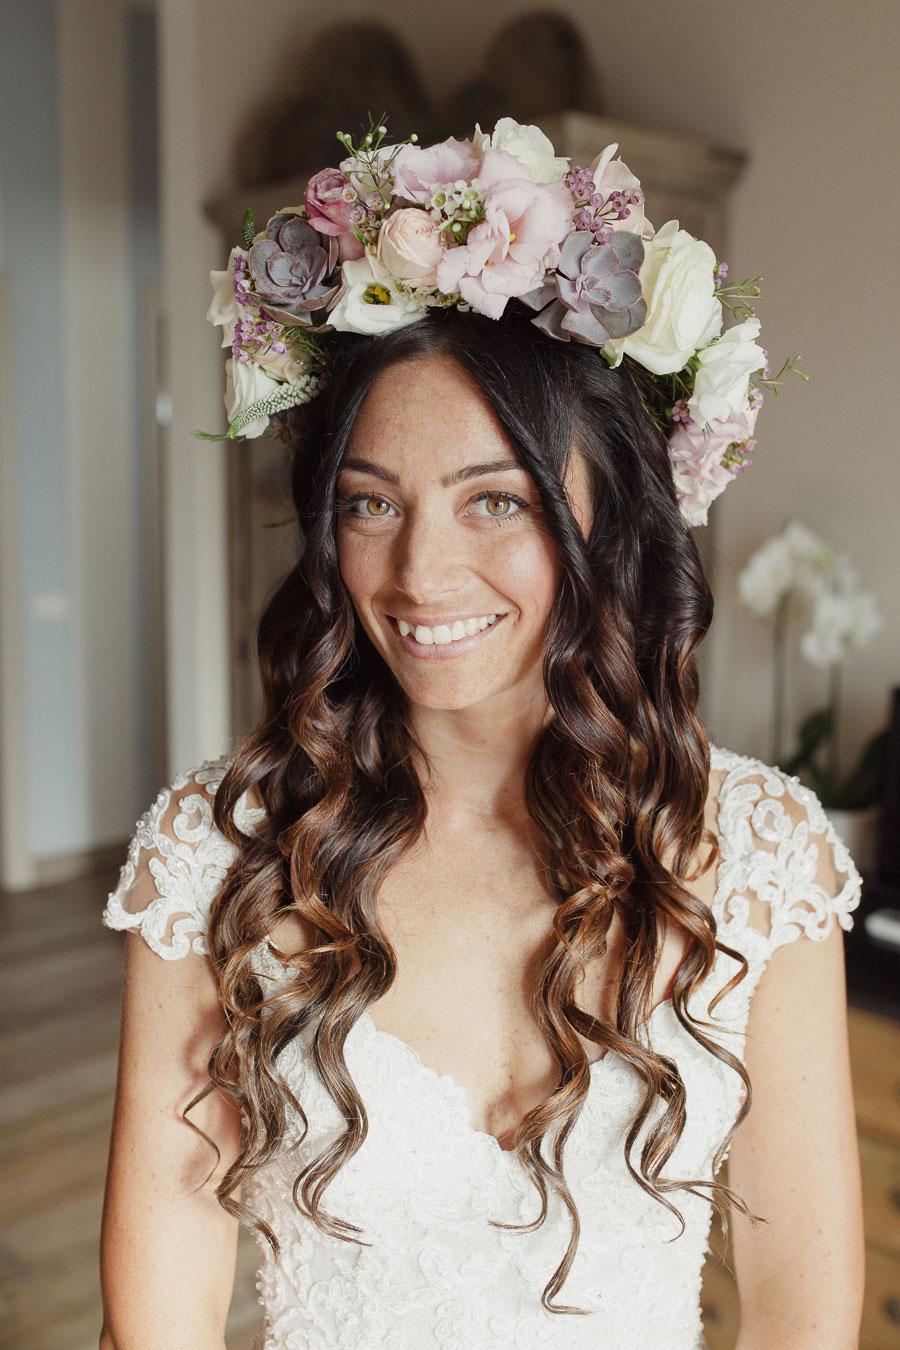 Wedding-Nicholad-and-Federica-Giuseppe-Giovannelli-279